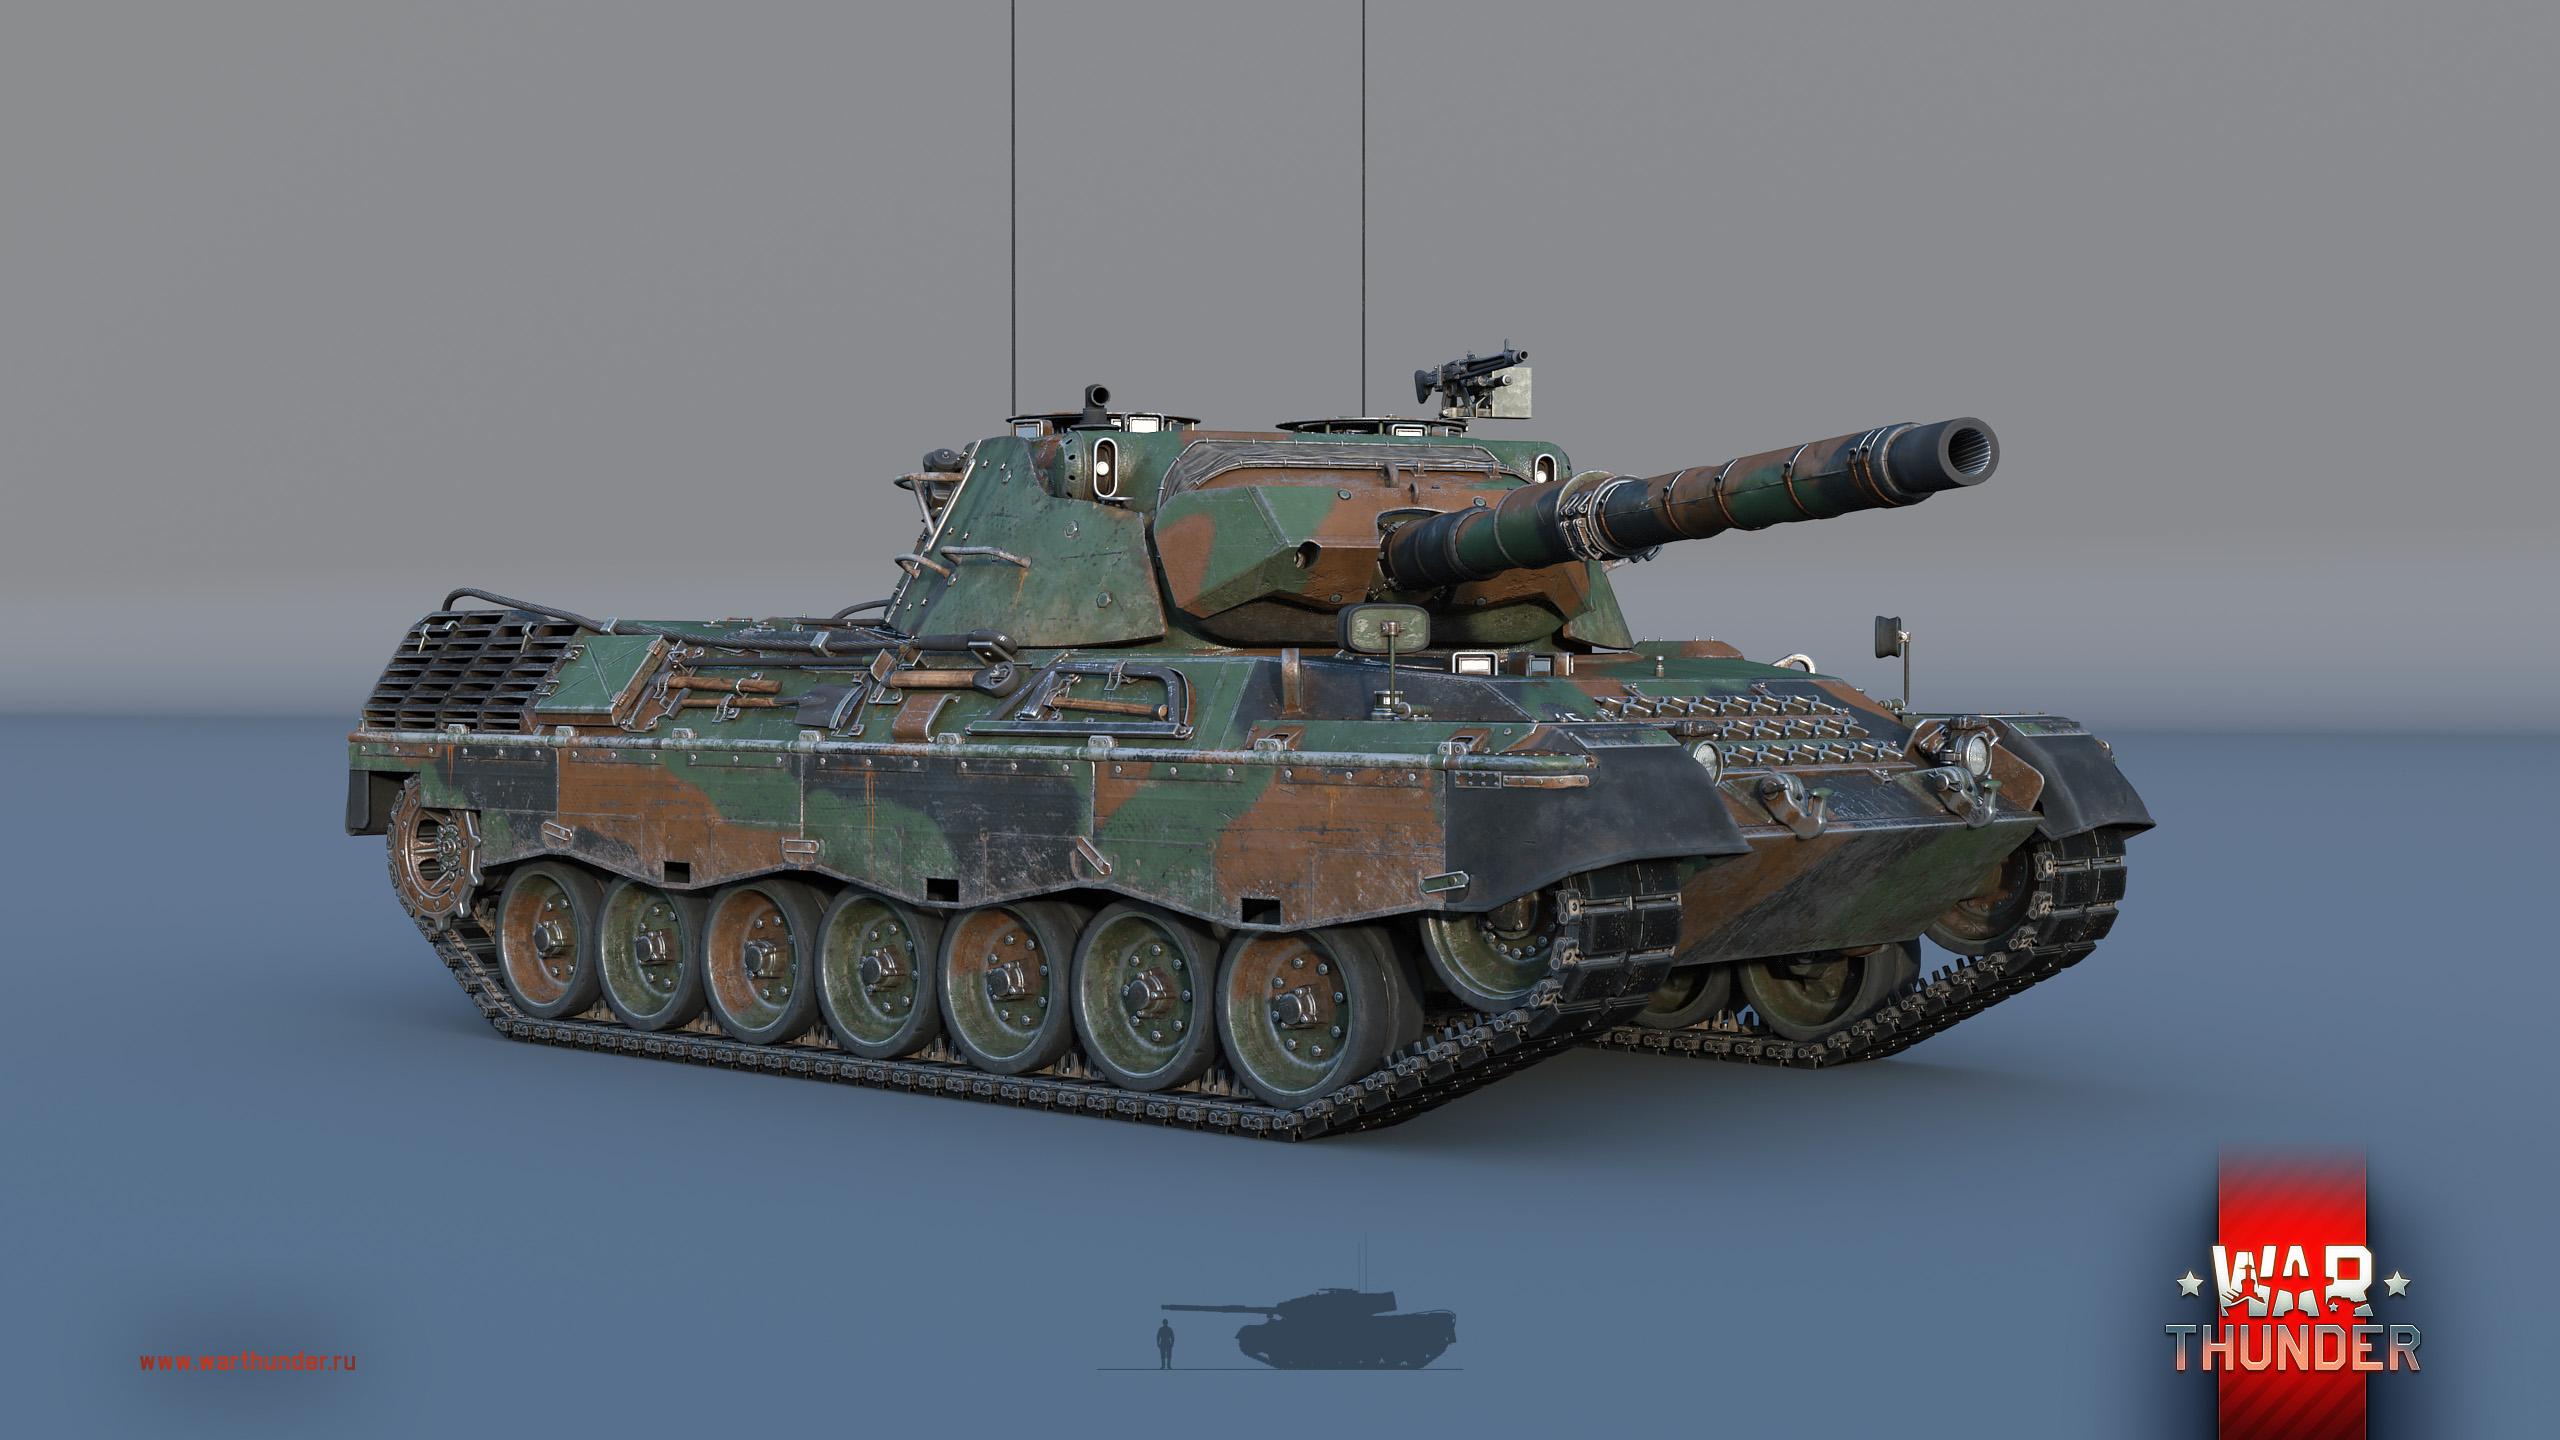 https://static.warthunder.ru/upload/image/media/wallpapers/leo_2560x1140_logo_ru_35dd3fbd5e3b9a069bdc5865c9c4ccd8.jpg